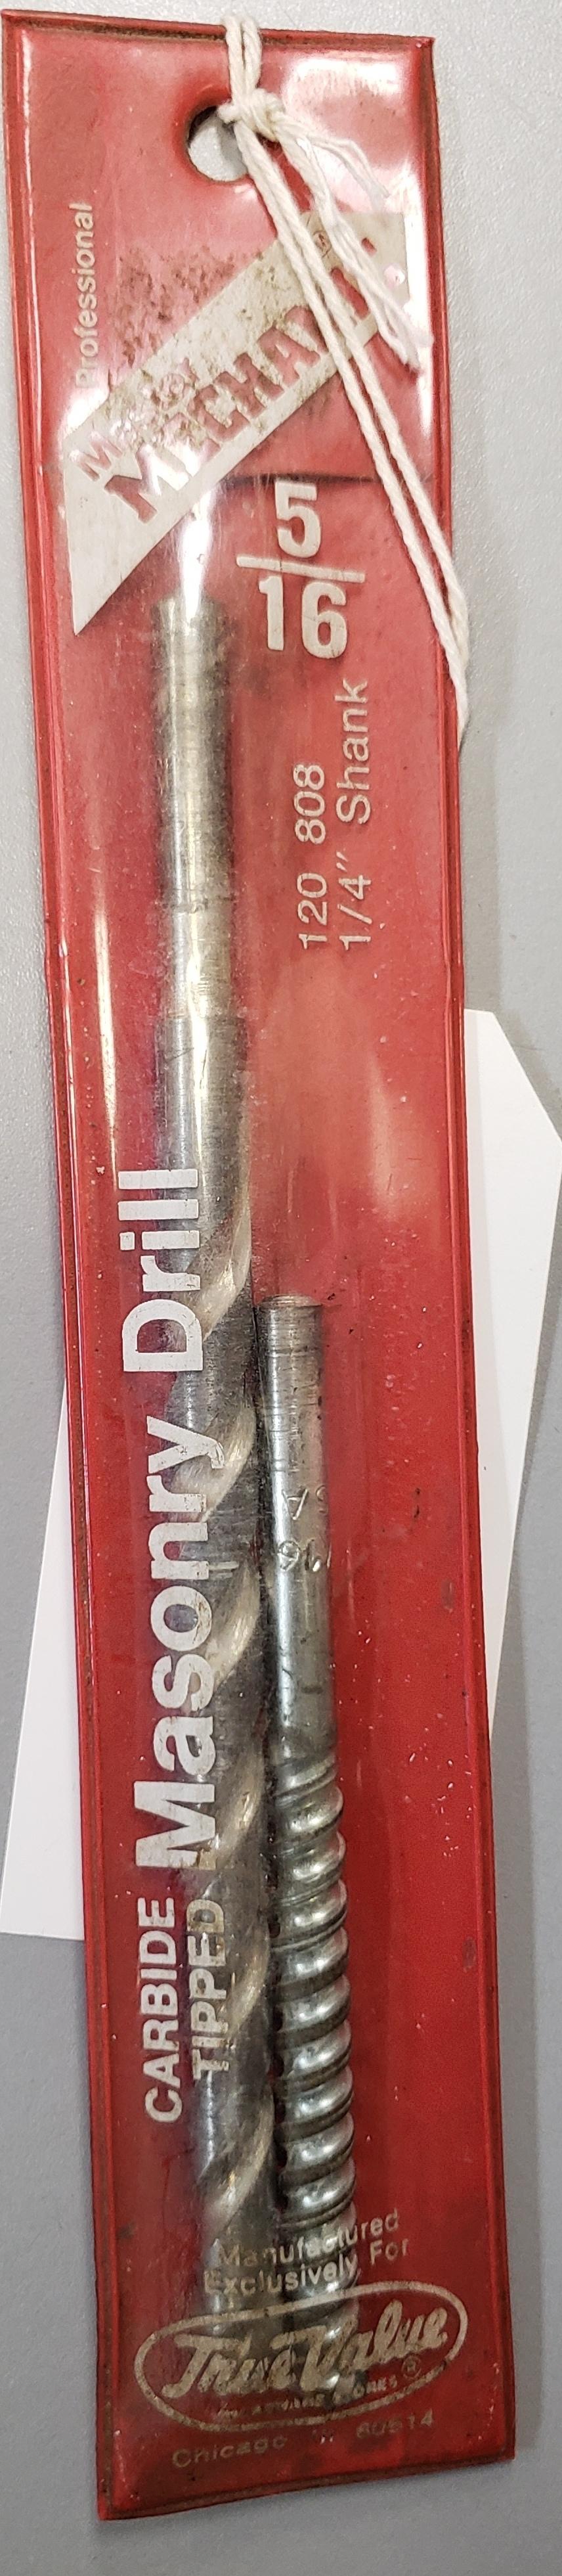 MASTER MECHANIC - 60614 - DRILL BITS TOOLS